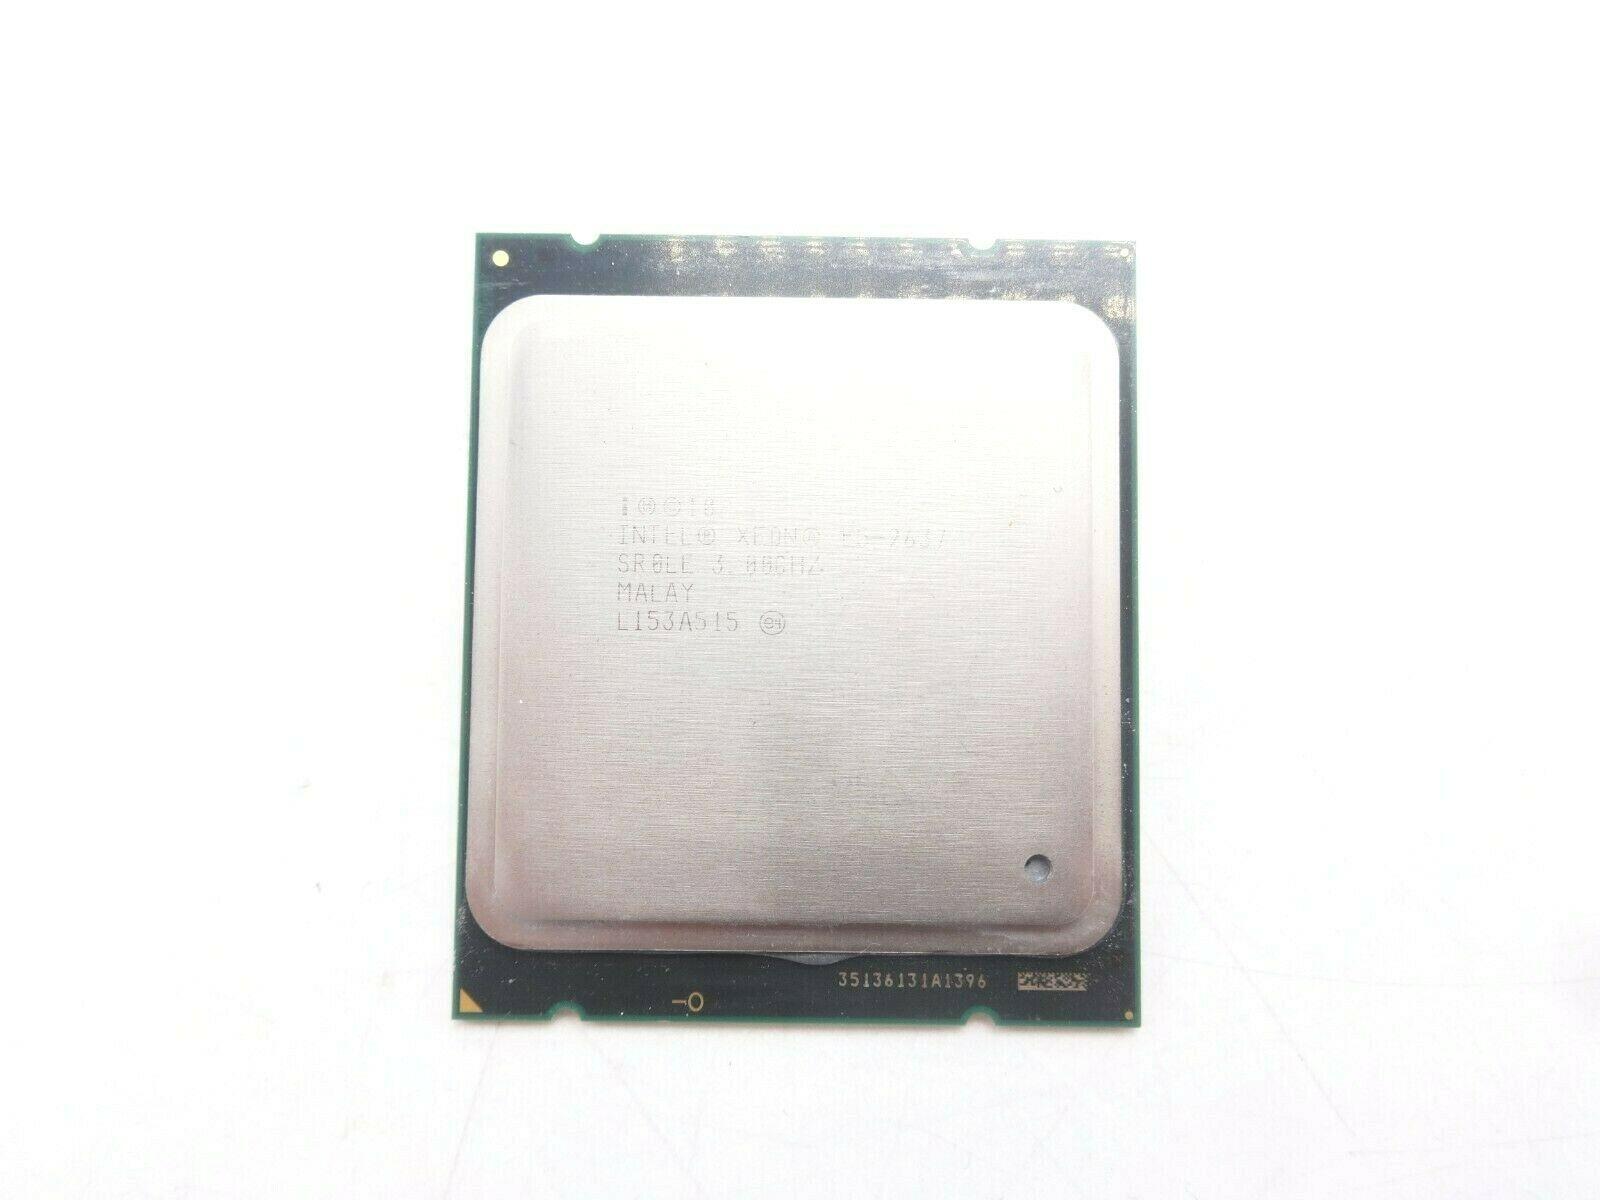 Intel SR0LE Xeon E5-2637 Dual Core 3.0GHZ 5MB CPU 670539-001 w// Thermal Grease